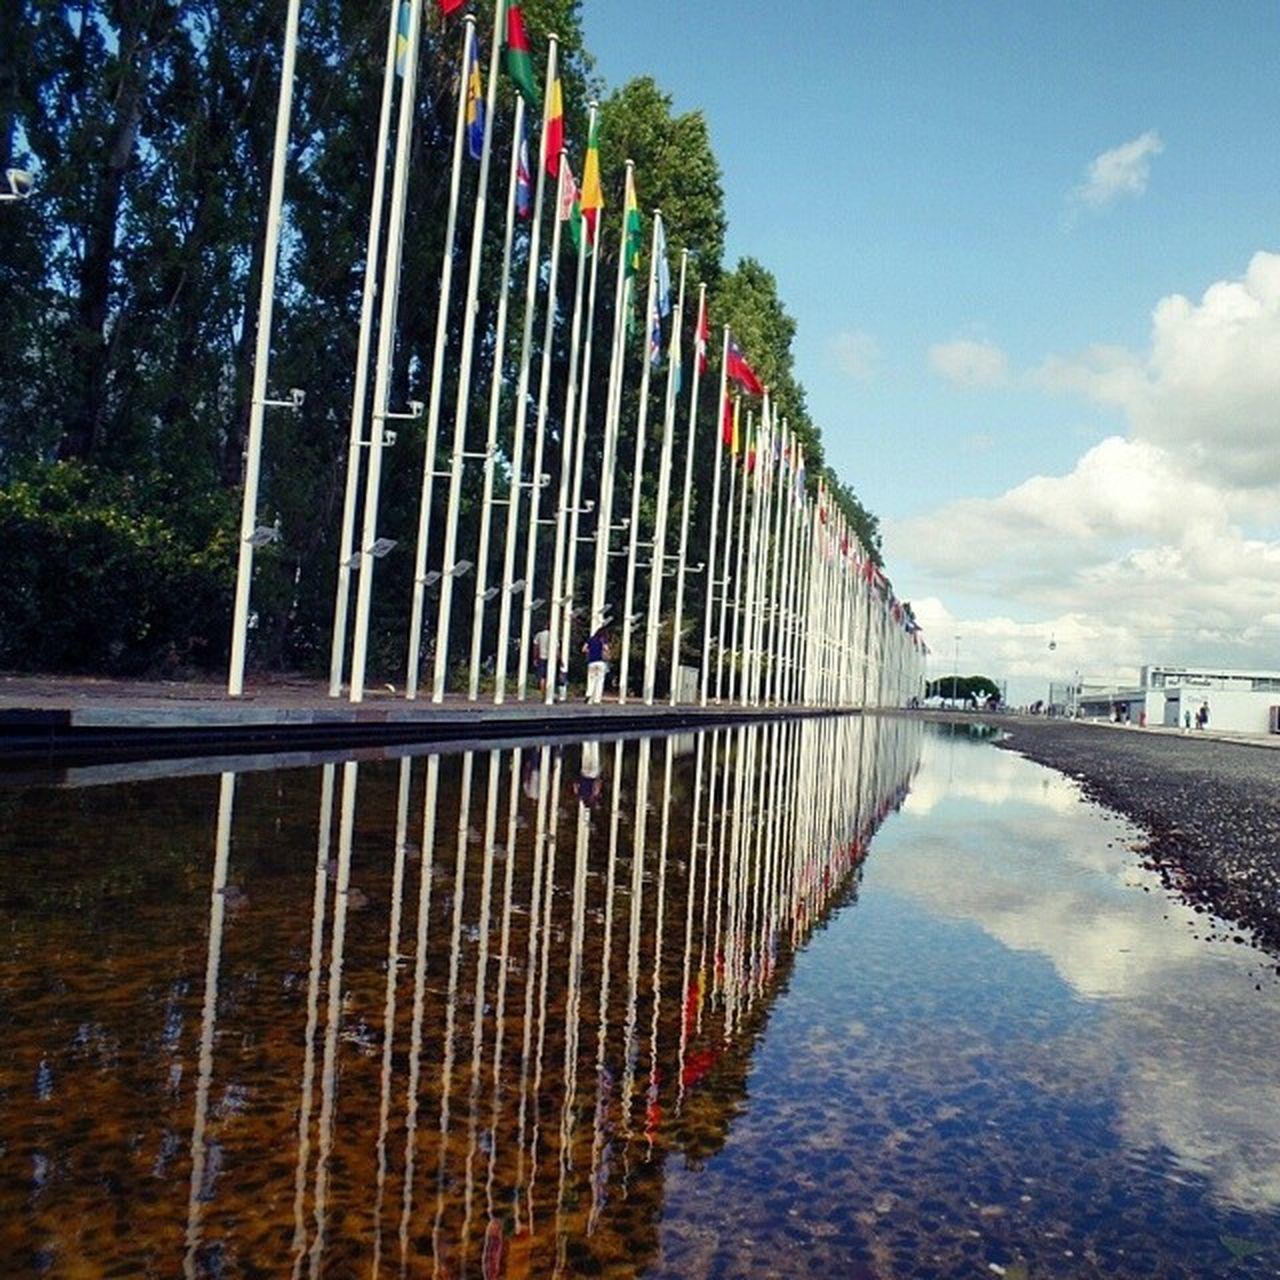 reflexo das nações reflection of nations Reflexos  Nacoes Bandeiras Espelho Reflections Nations Mirror Lisboa Lisbon Lisbonforever Agora Now